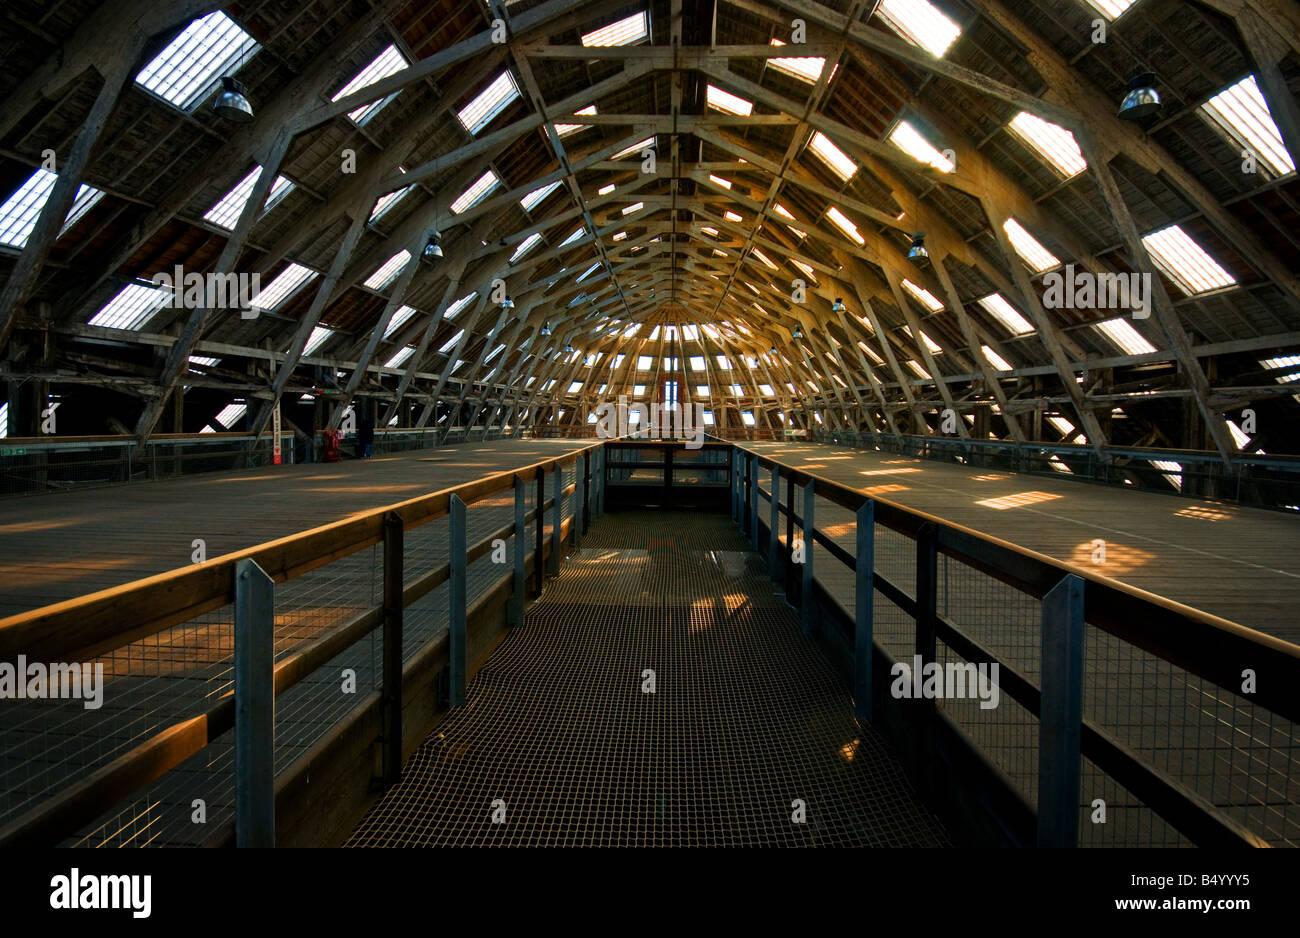 No 3 Slip Cover Chatham Historic Dockyard in Kent. - Stock Image